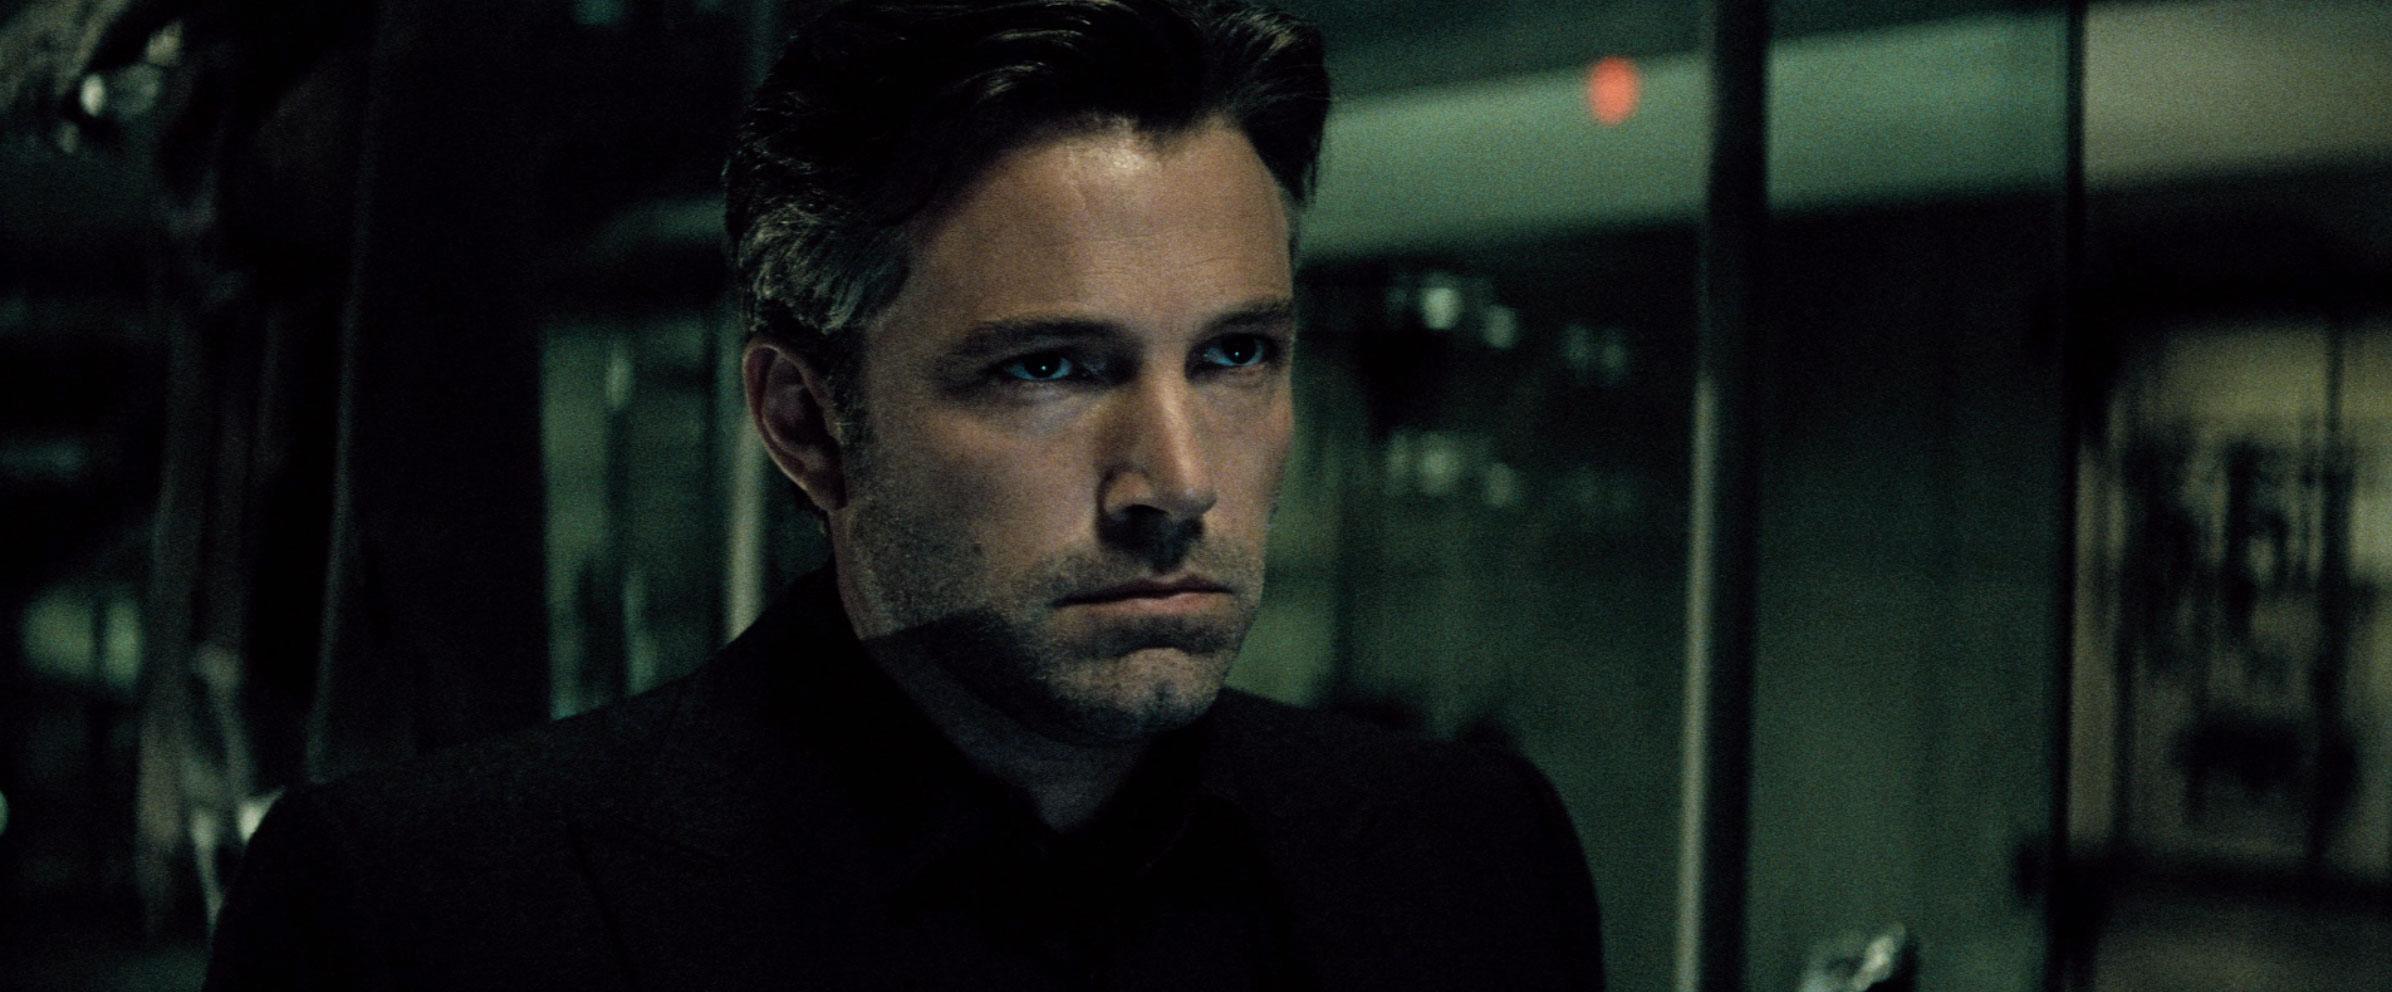 Batman's Suicide Squad Cameo – Is True?